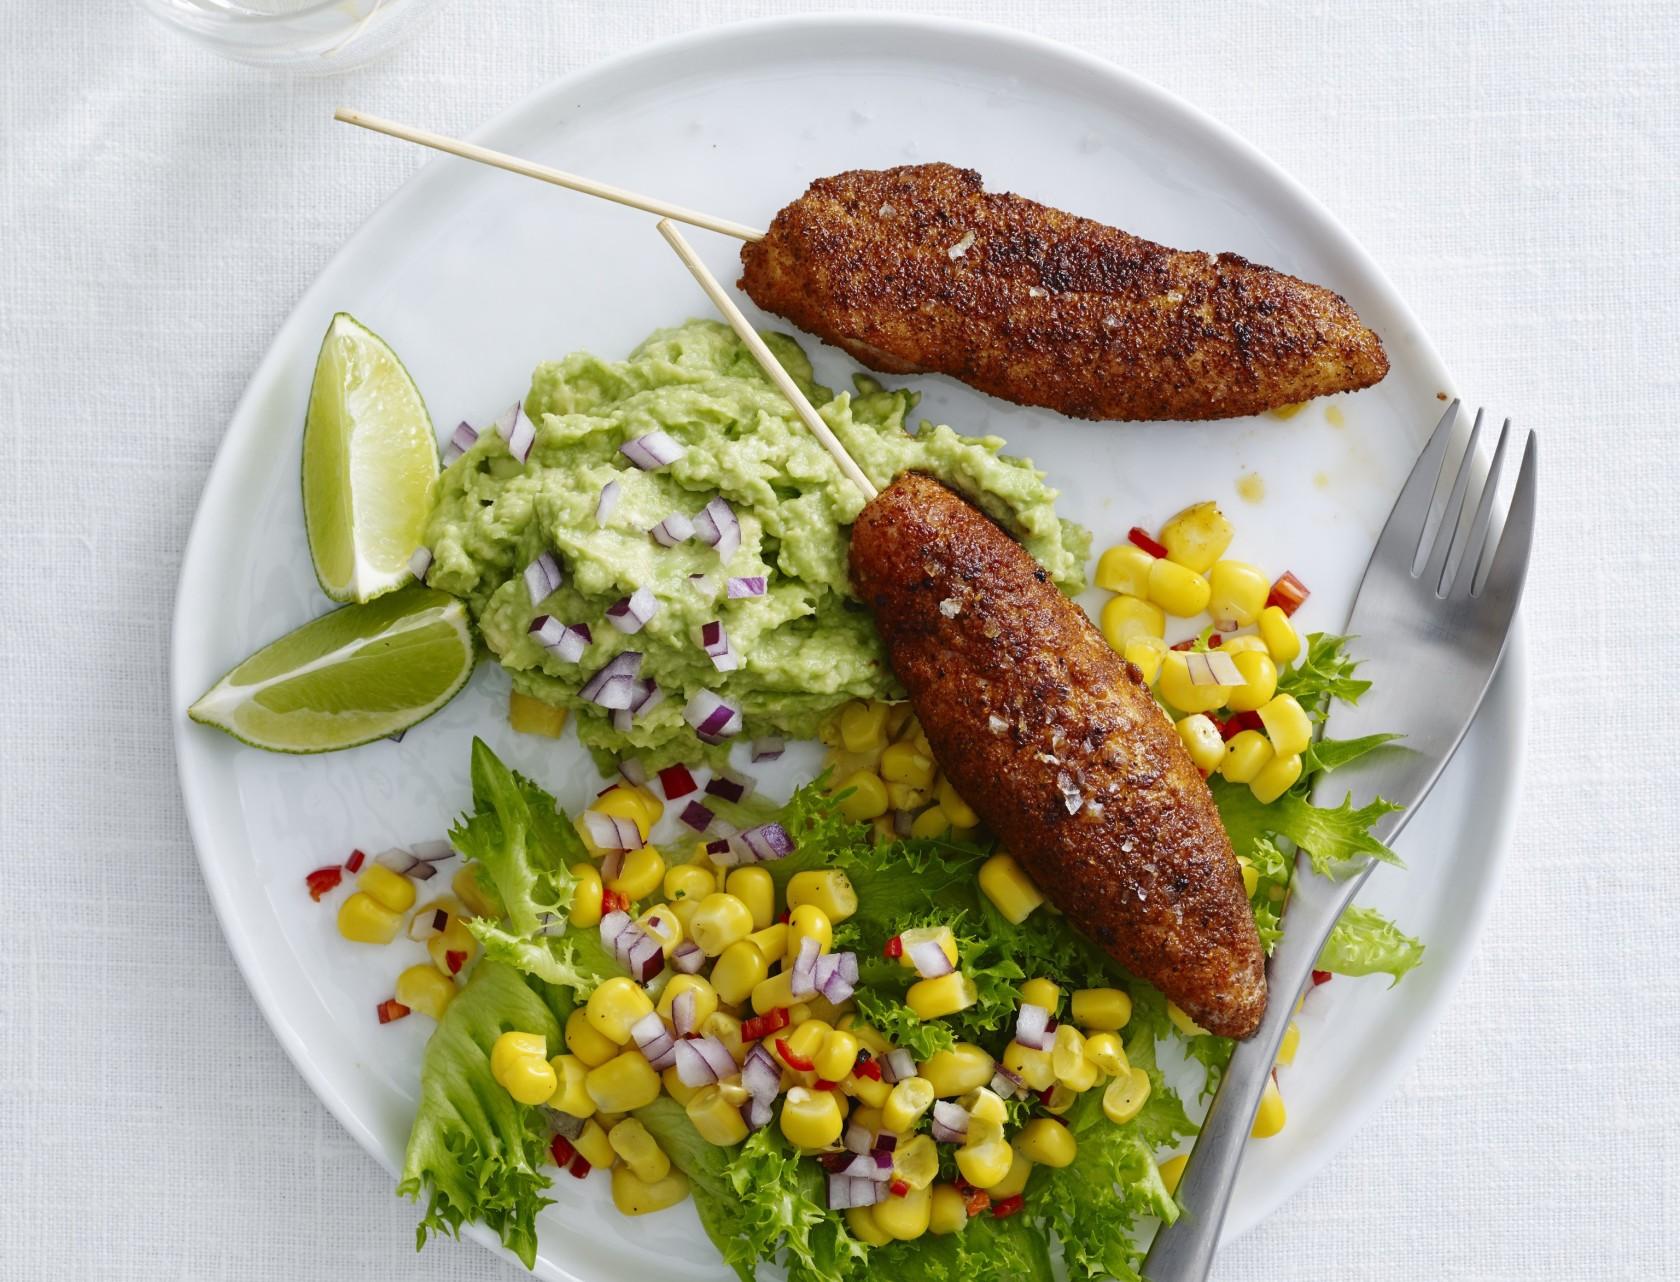 Kyllingespyd med tandoorikrydderi og lækkert tilbehør